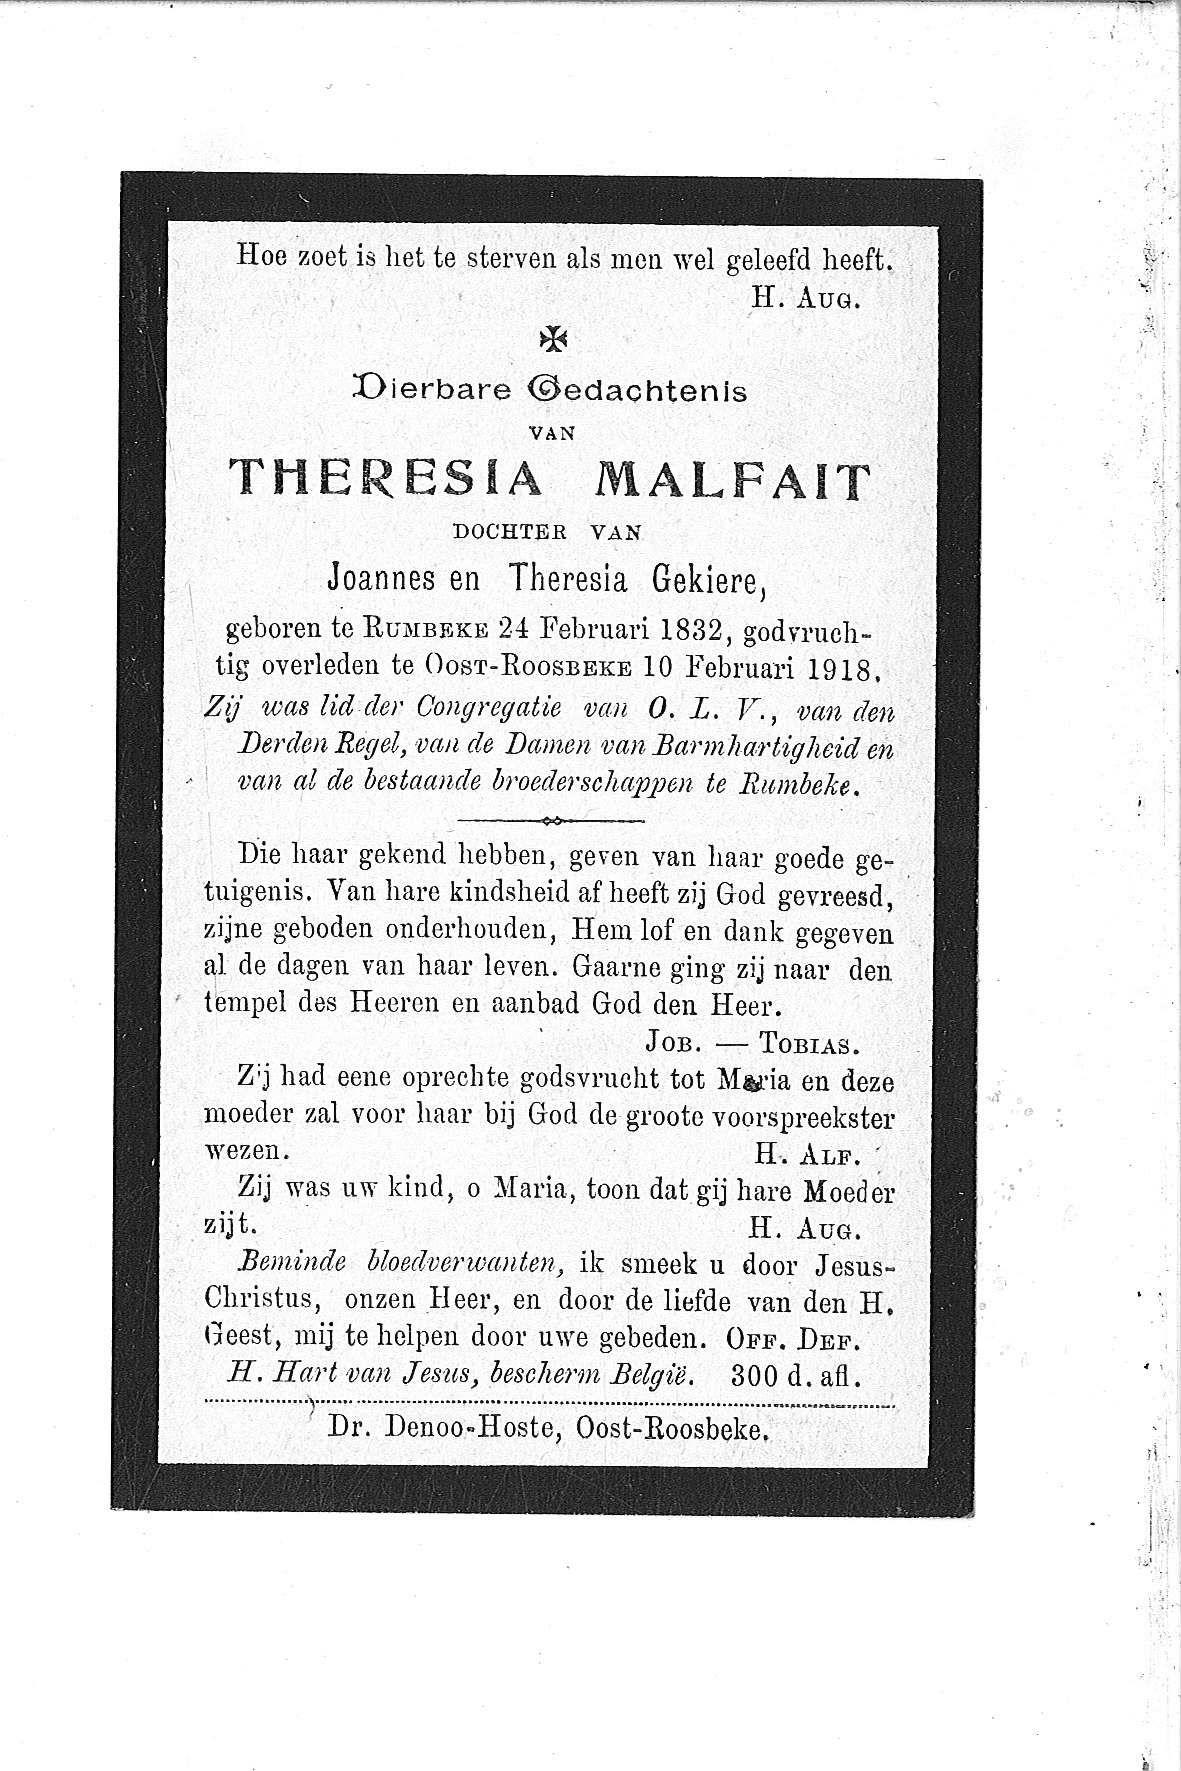 Theresia (1918) 20111121154356_00262.jpg